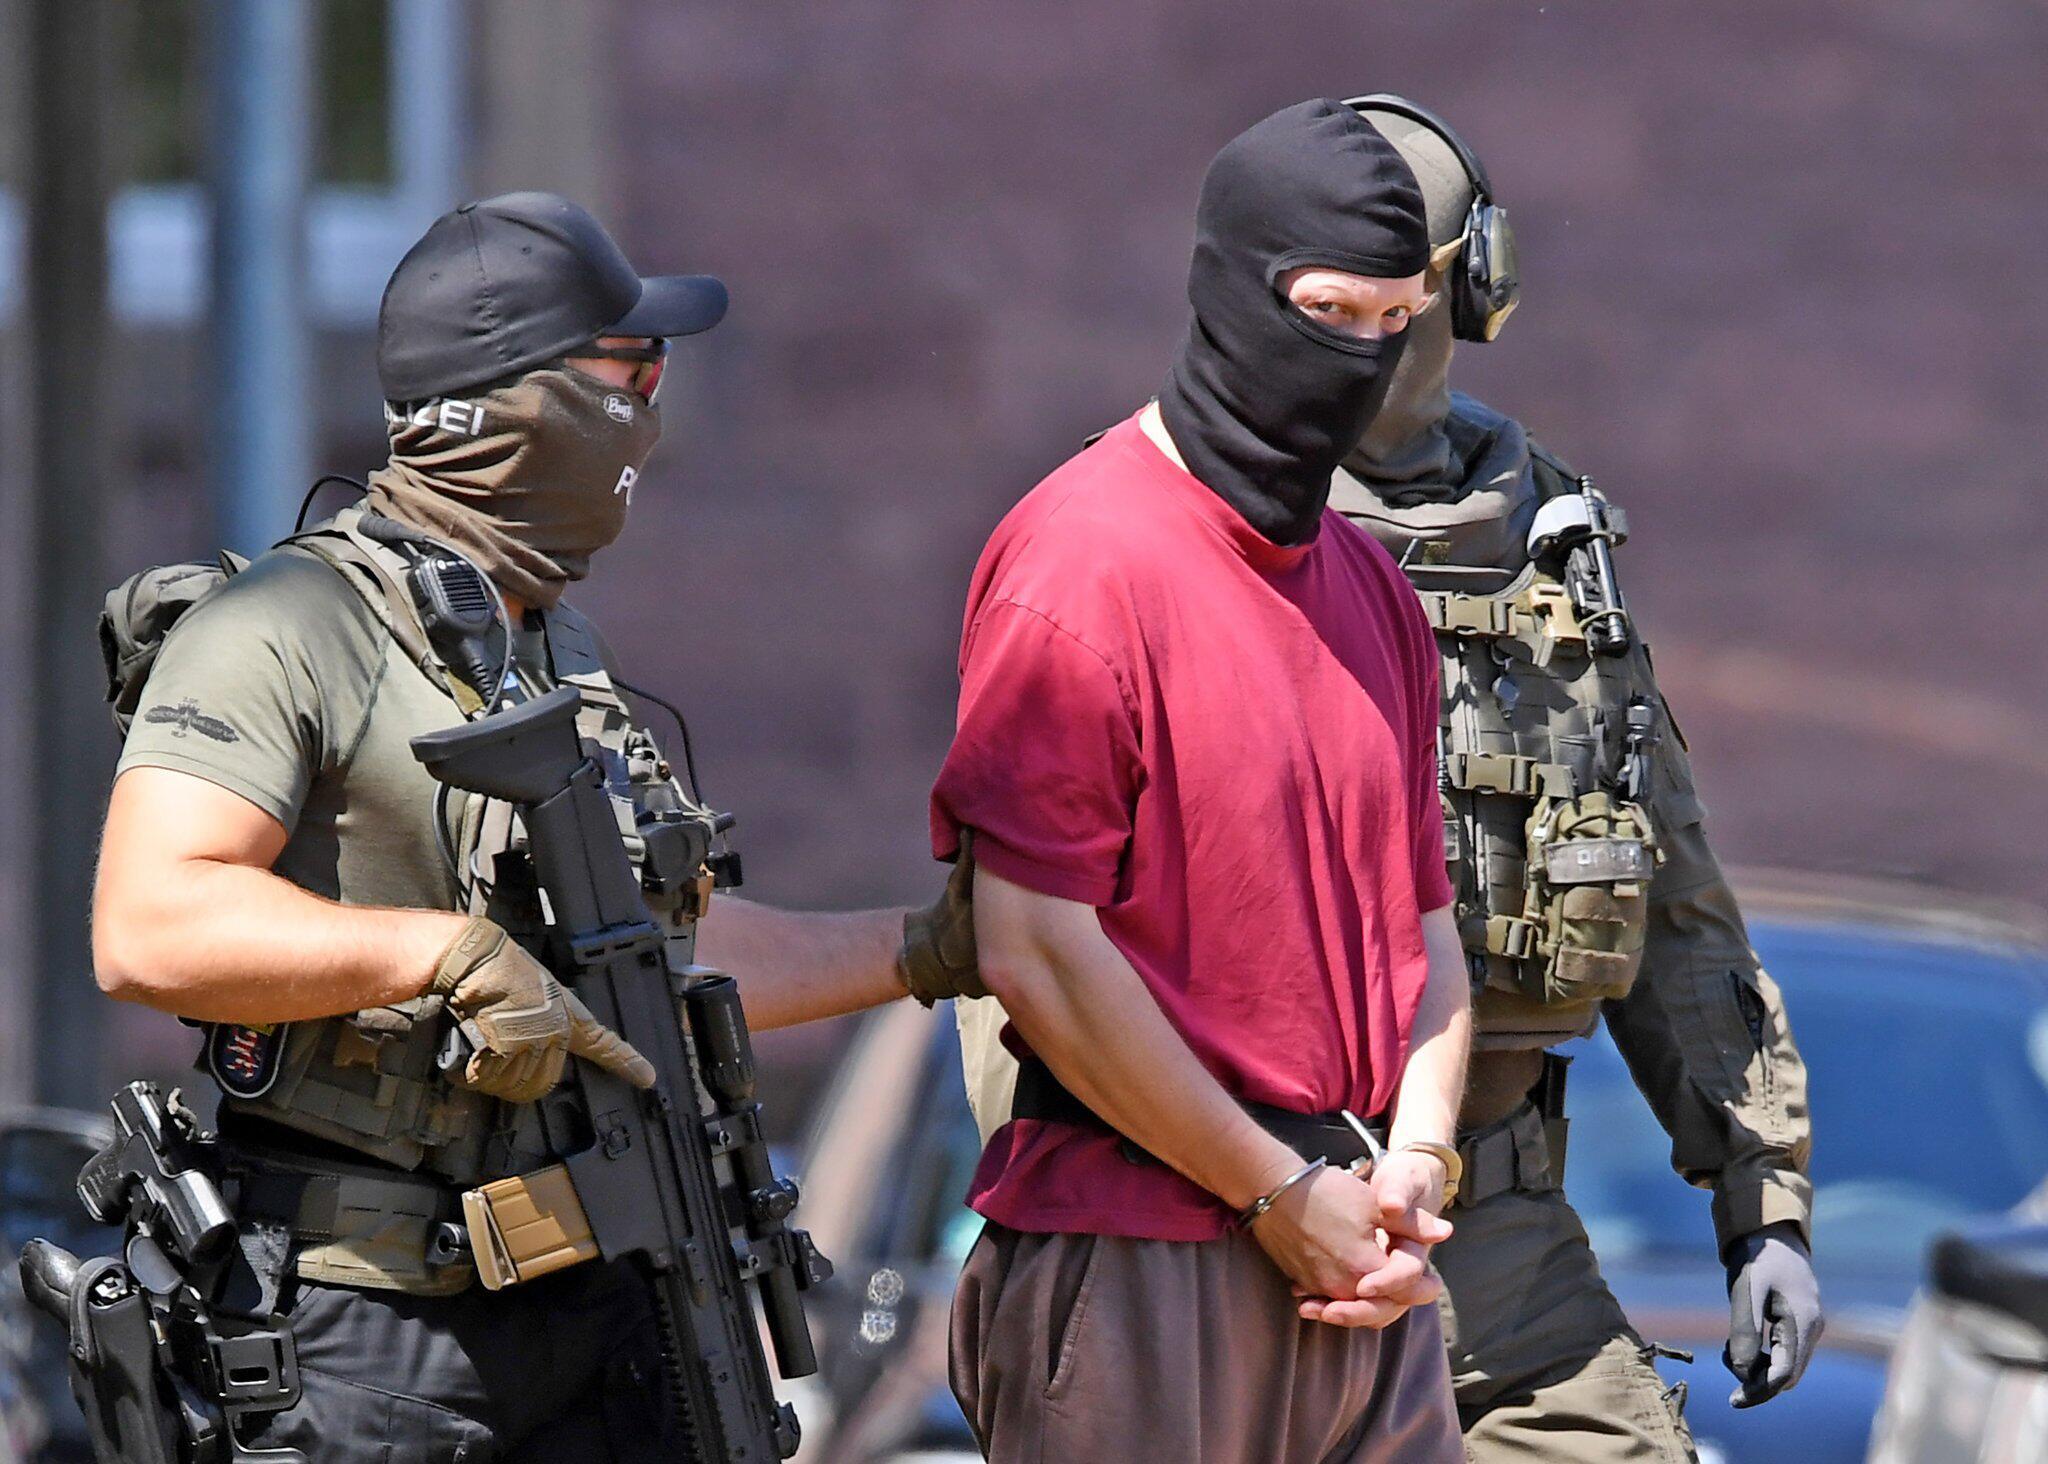 Bild zu Haftprüfungstermin im Mordfall Lübcke